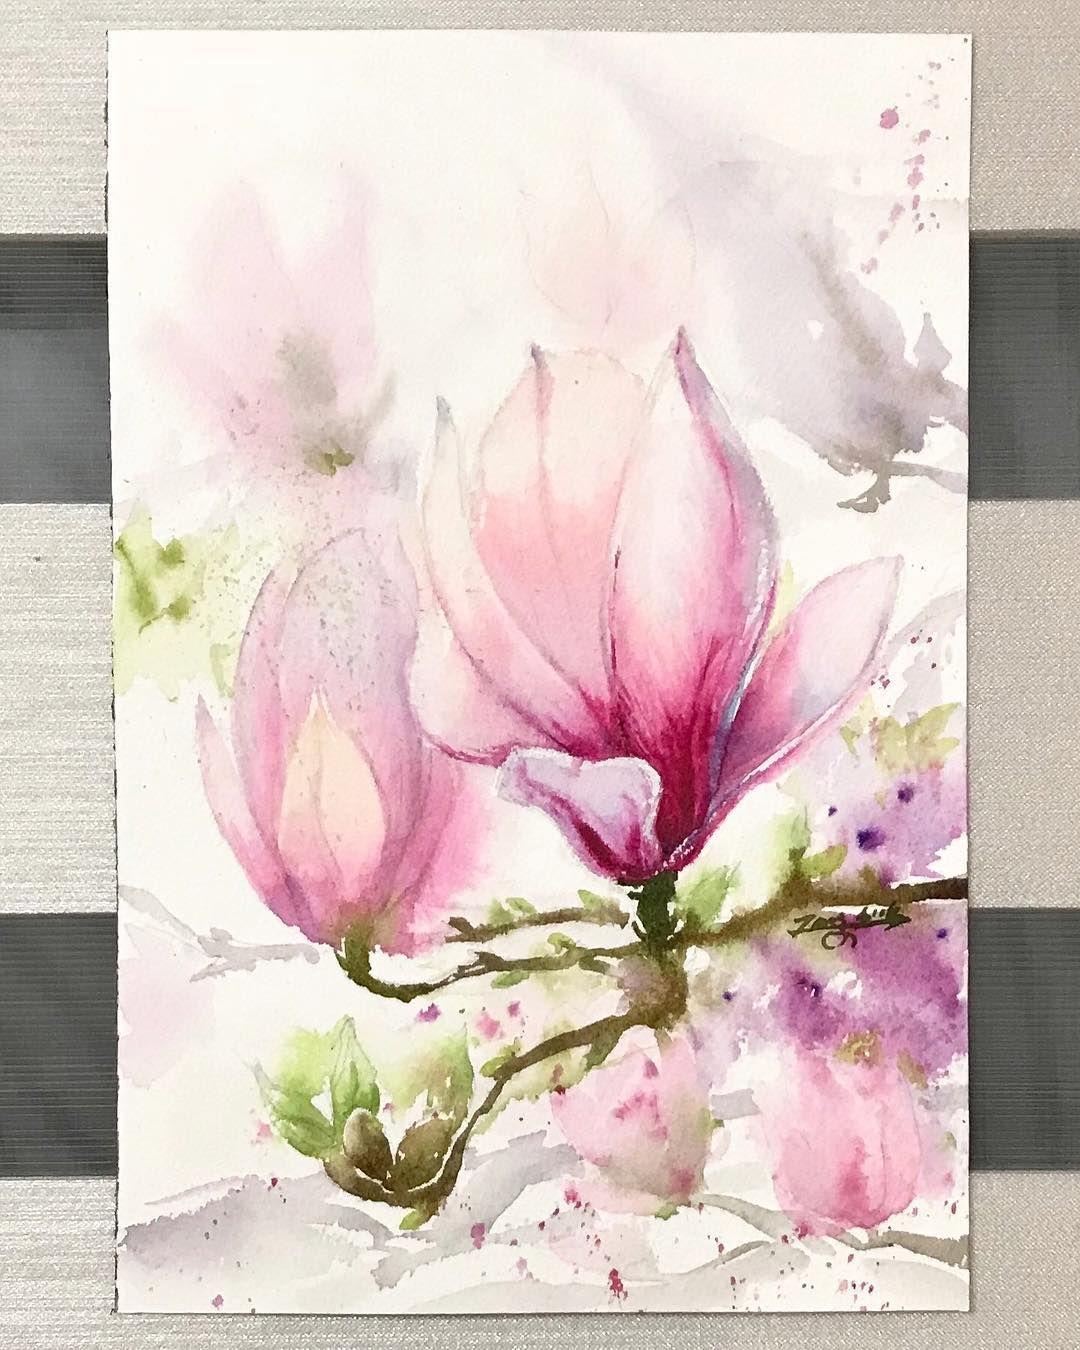 Another magnolia #magnolia #watercolor #watercolour #watercolours ...